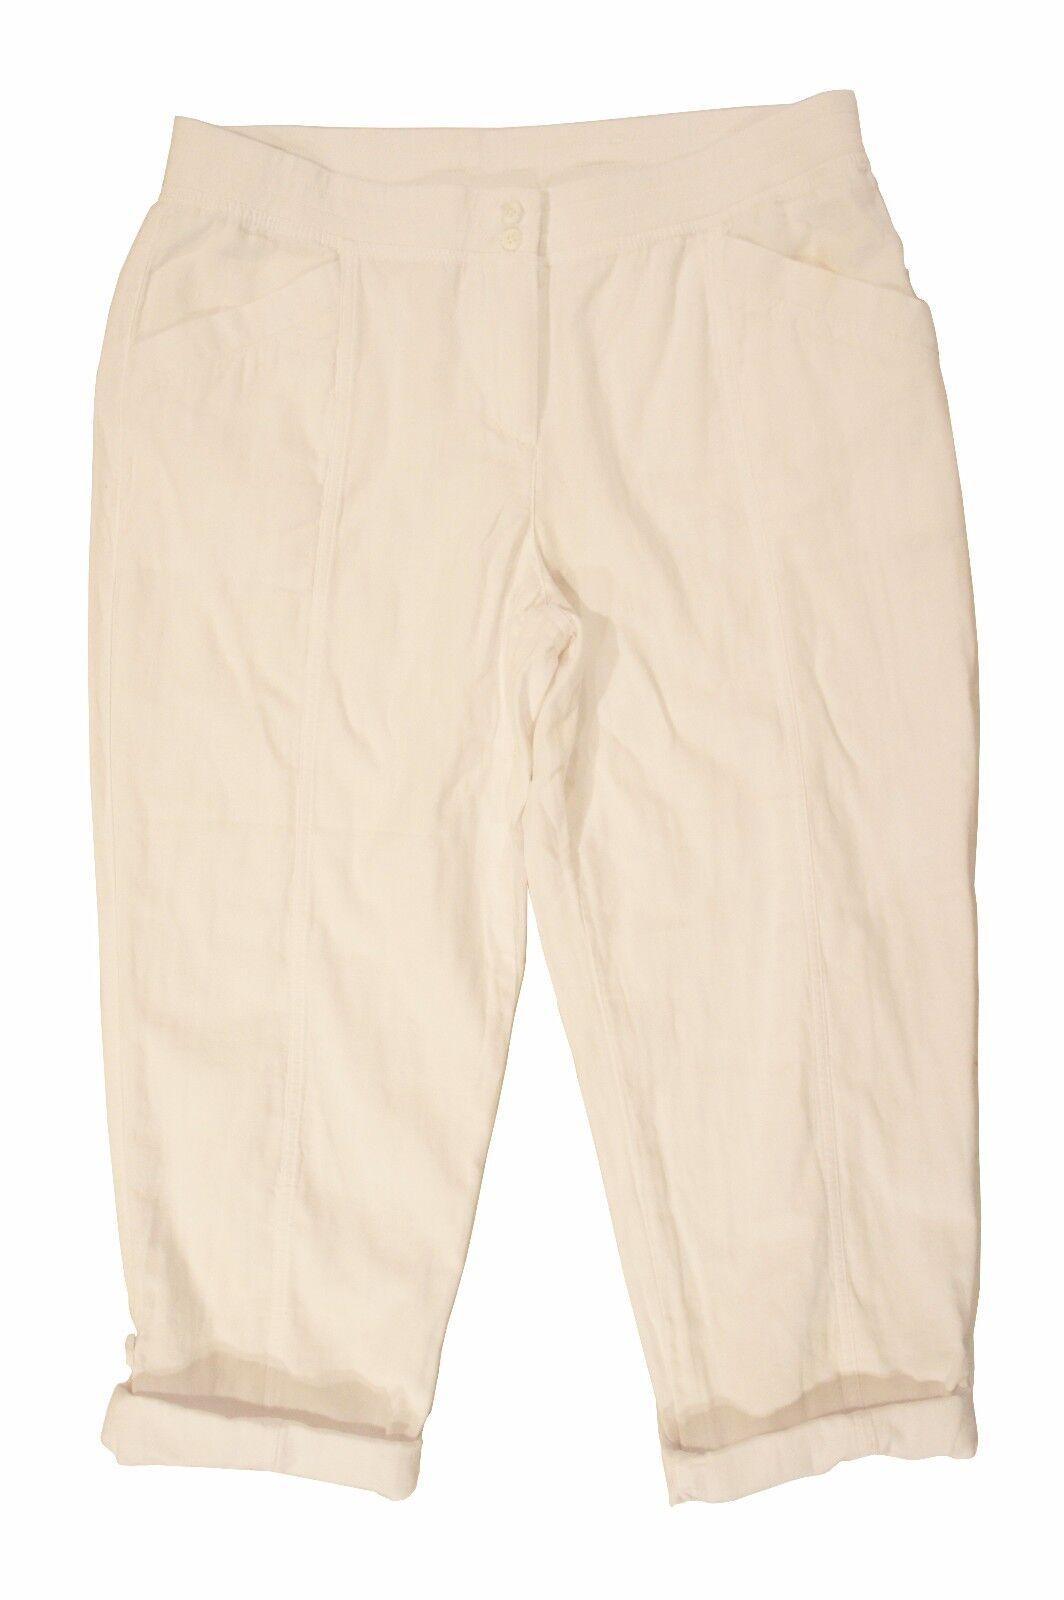 J. Jill Women's Lightweight White Cuffed Capri Pants Sz 12